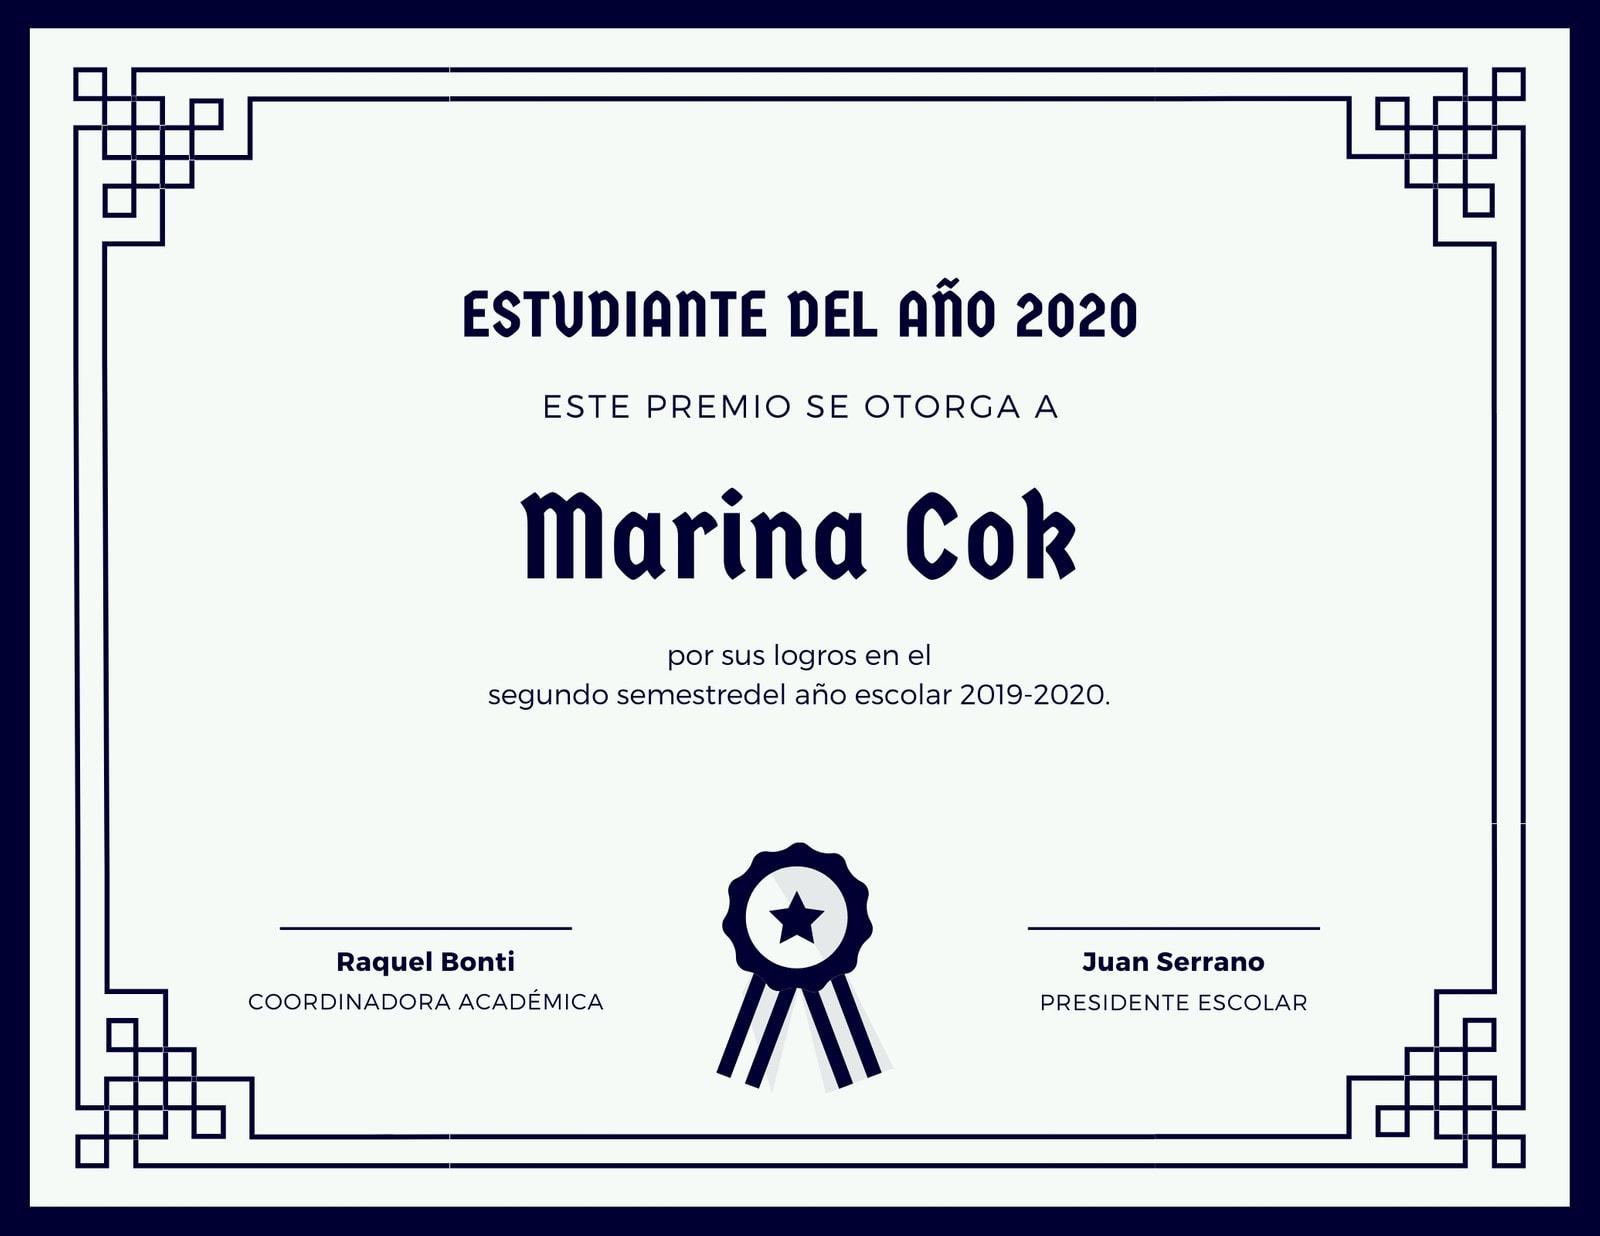 Azul Oscuro Con Borde Certificado Estudiantil